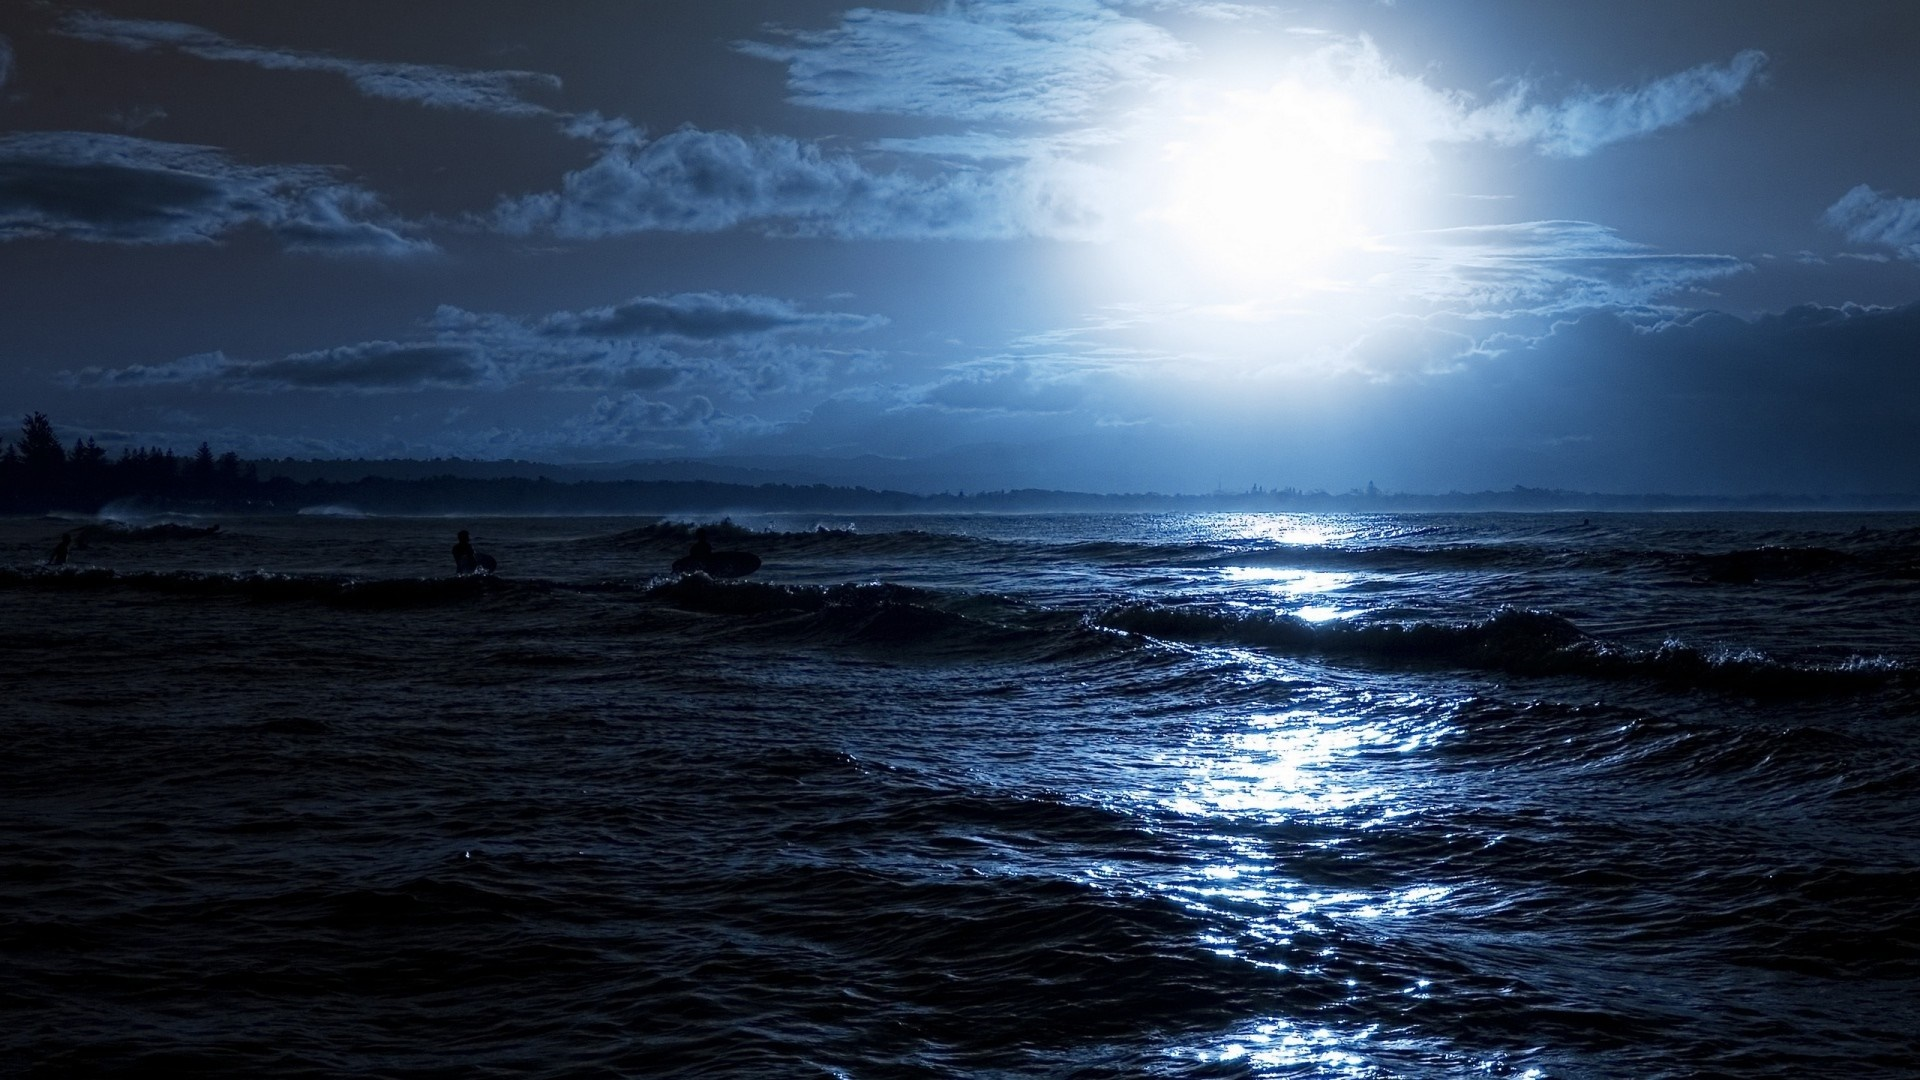 Night Sea wallpaper